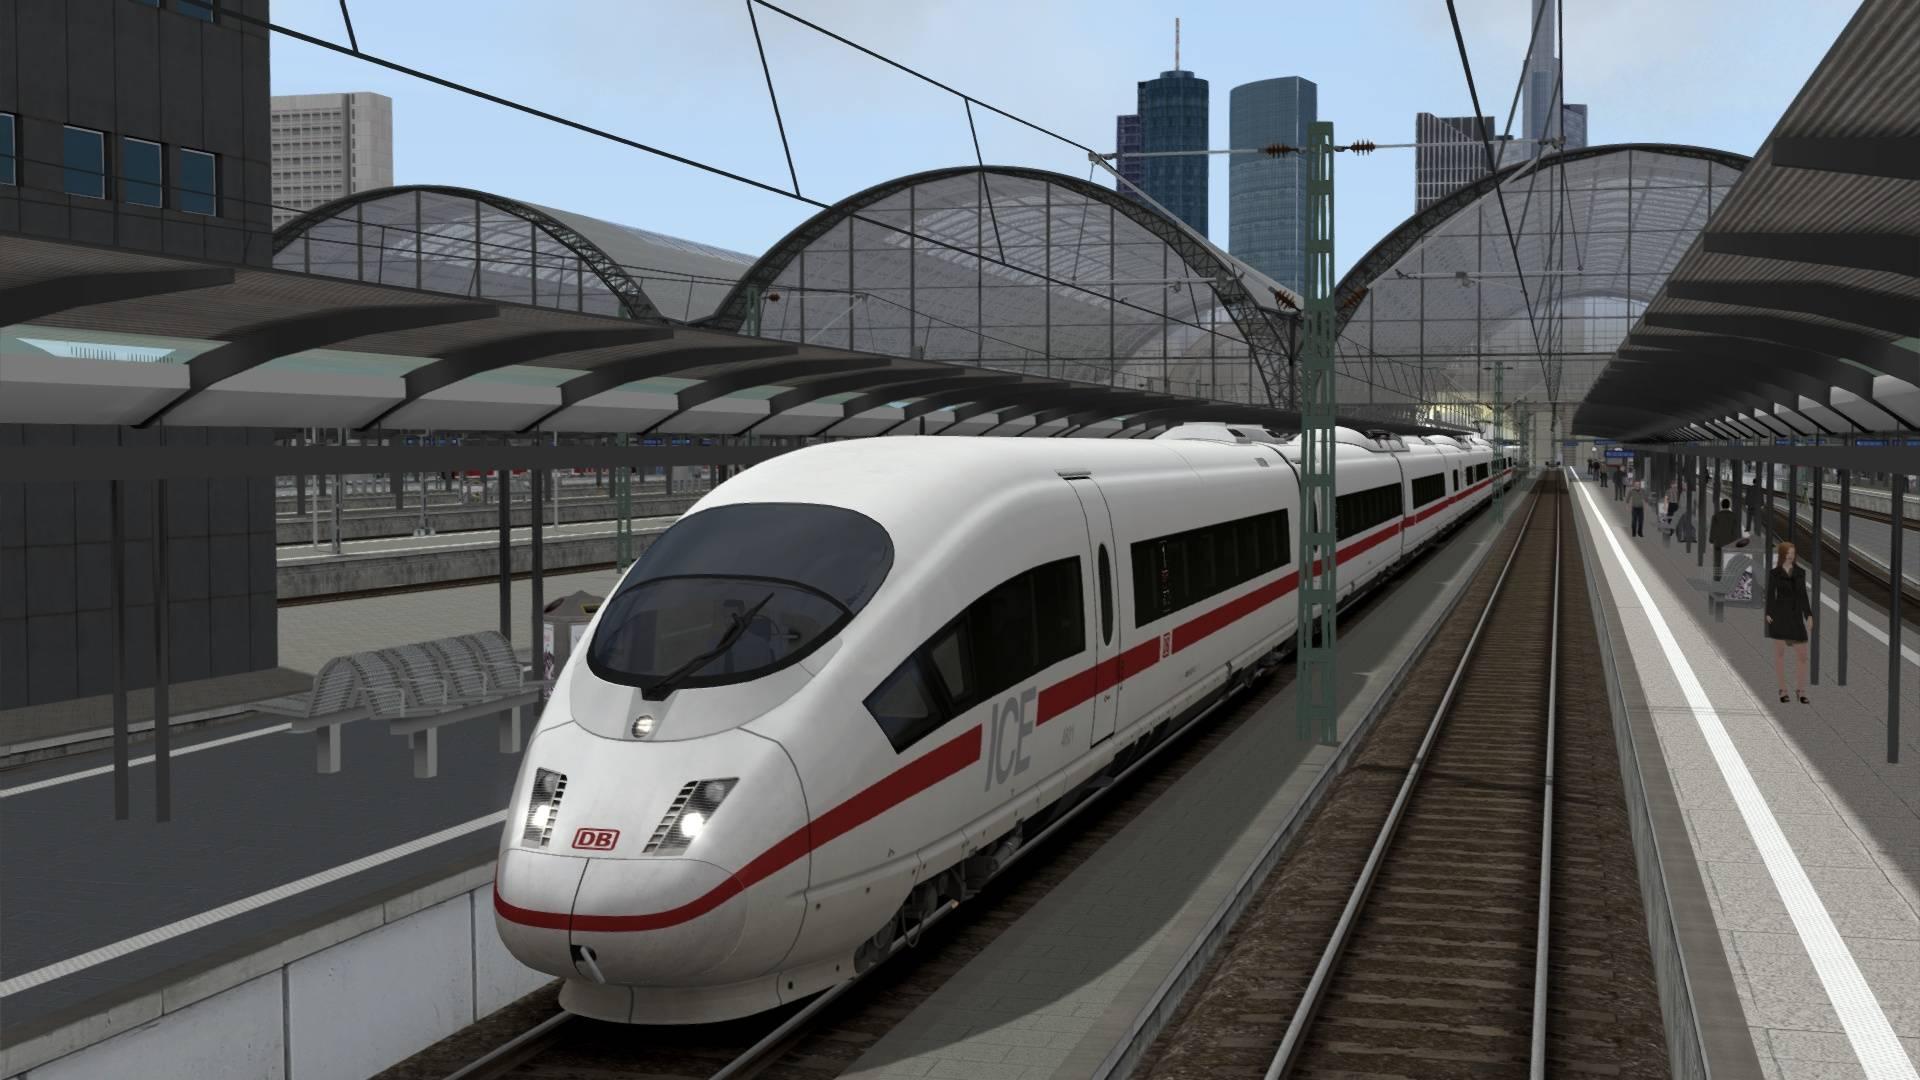 Trainz simulator 2019 | Trainz Railroad Simulator 2019 Download